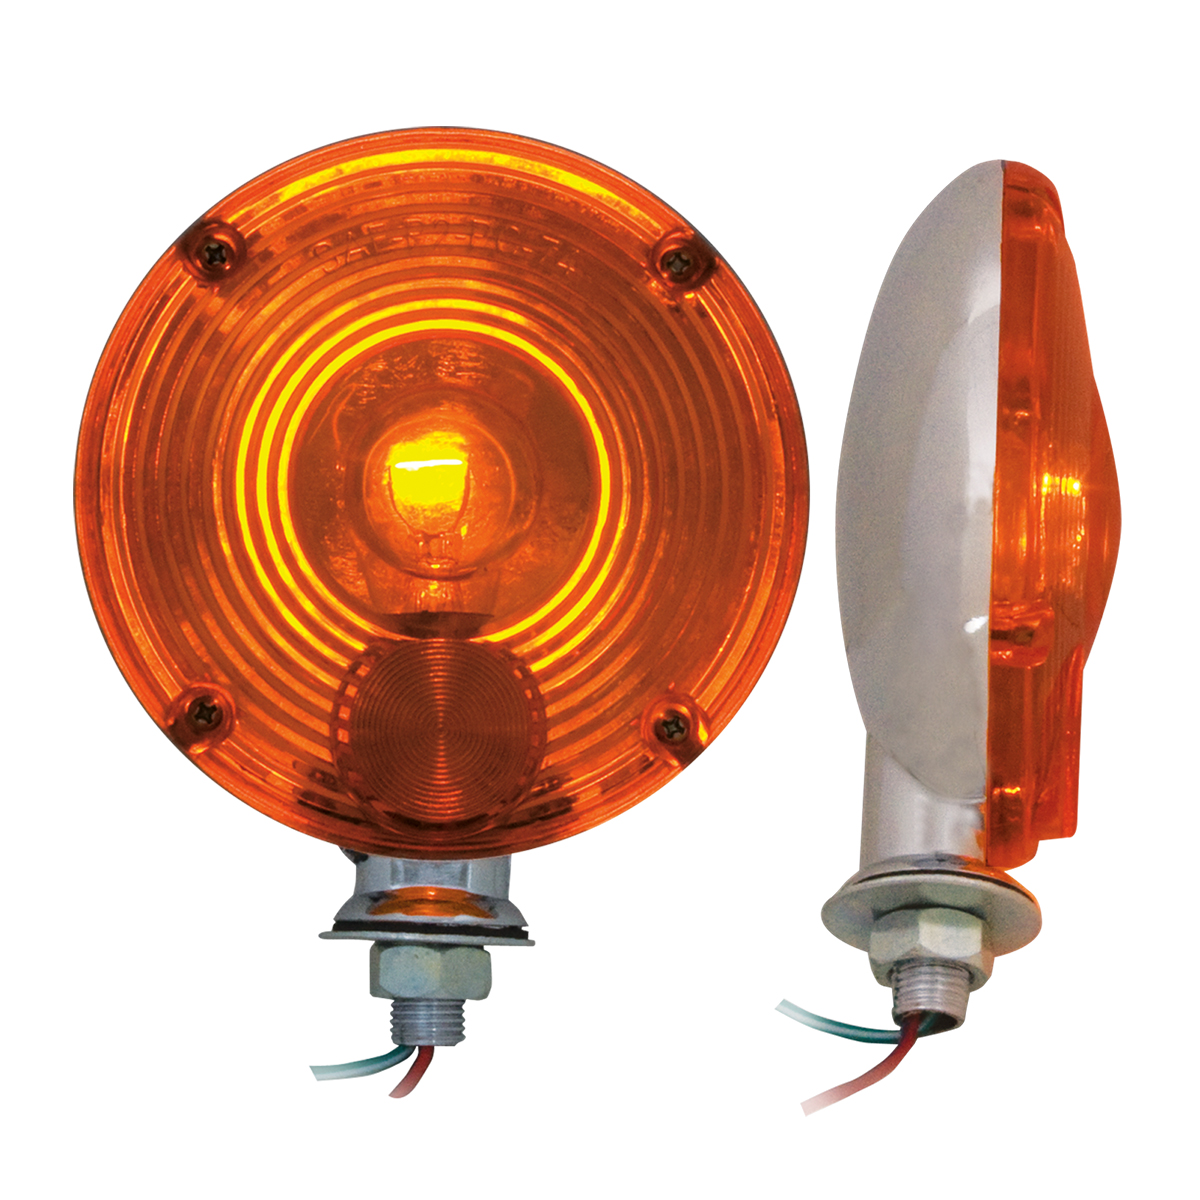 "#80321 4"" Single Face Light Duty Pedestal Amber Light"